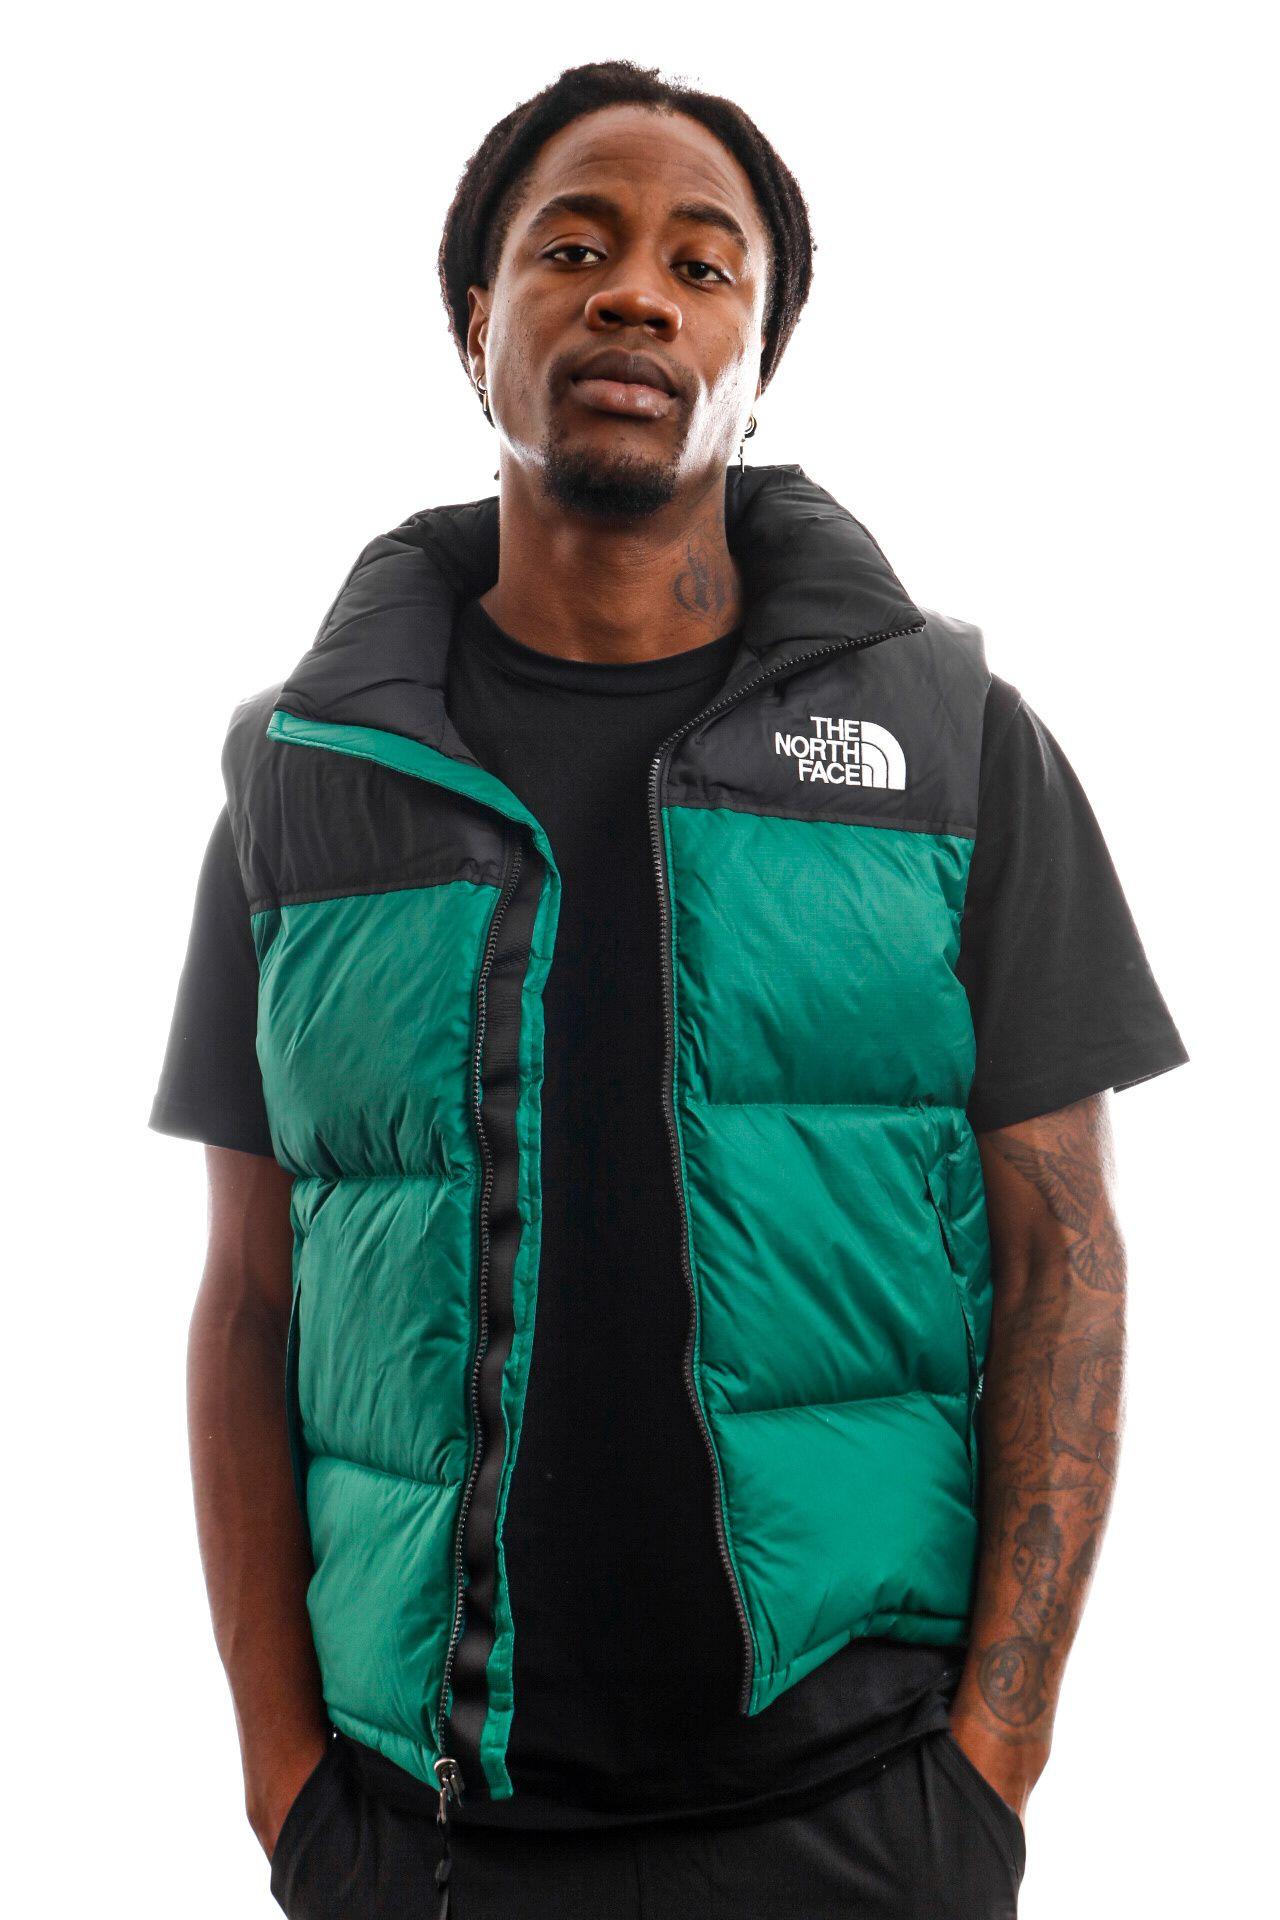 Afbeelding van The North Face Bodywarmer Men's 1996 Retro Nuptse Vest Evergreen NF0A3JQQNL11